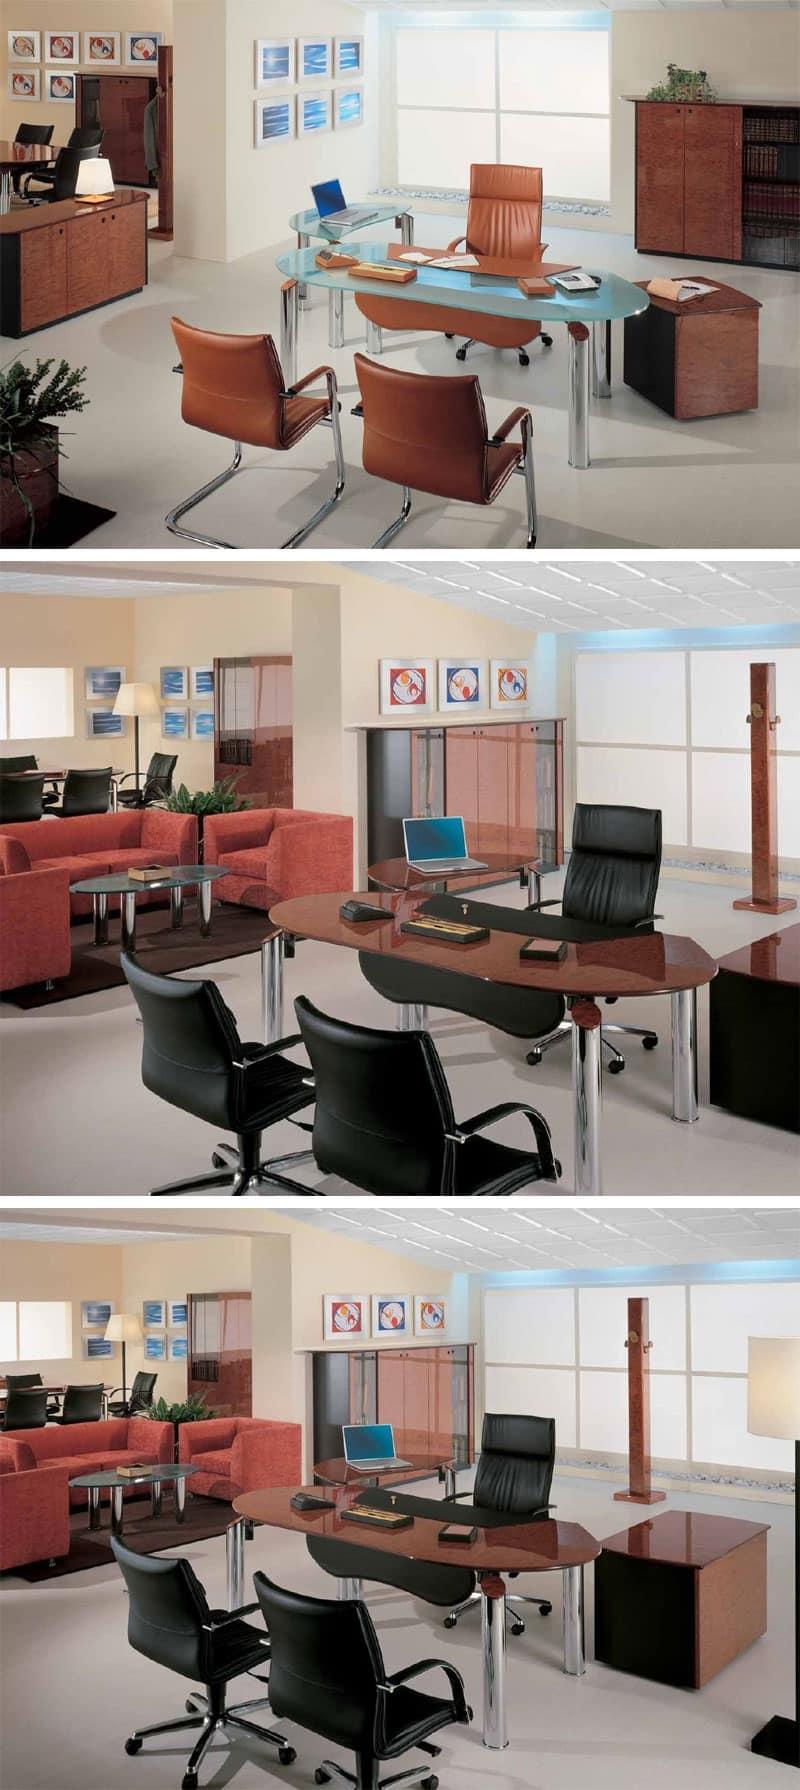 Sistema modulare ufficio ufficio manager idfdesign for Ufficio wall street